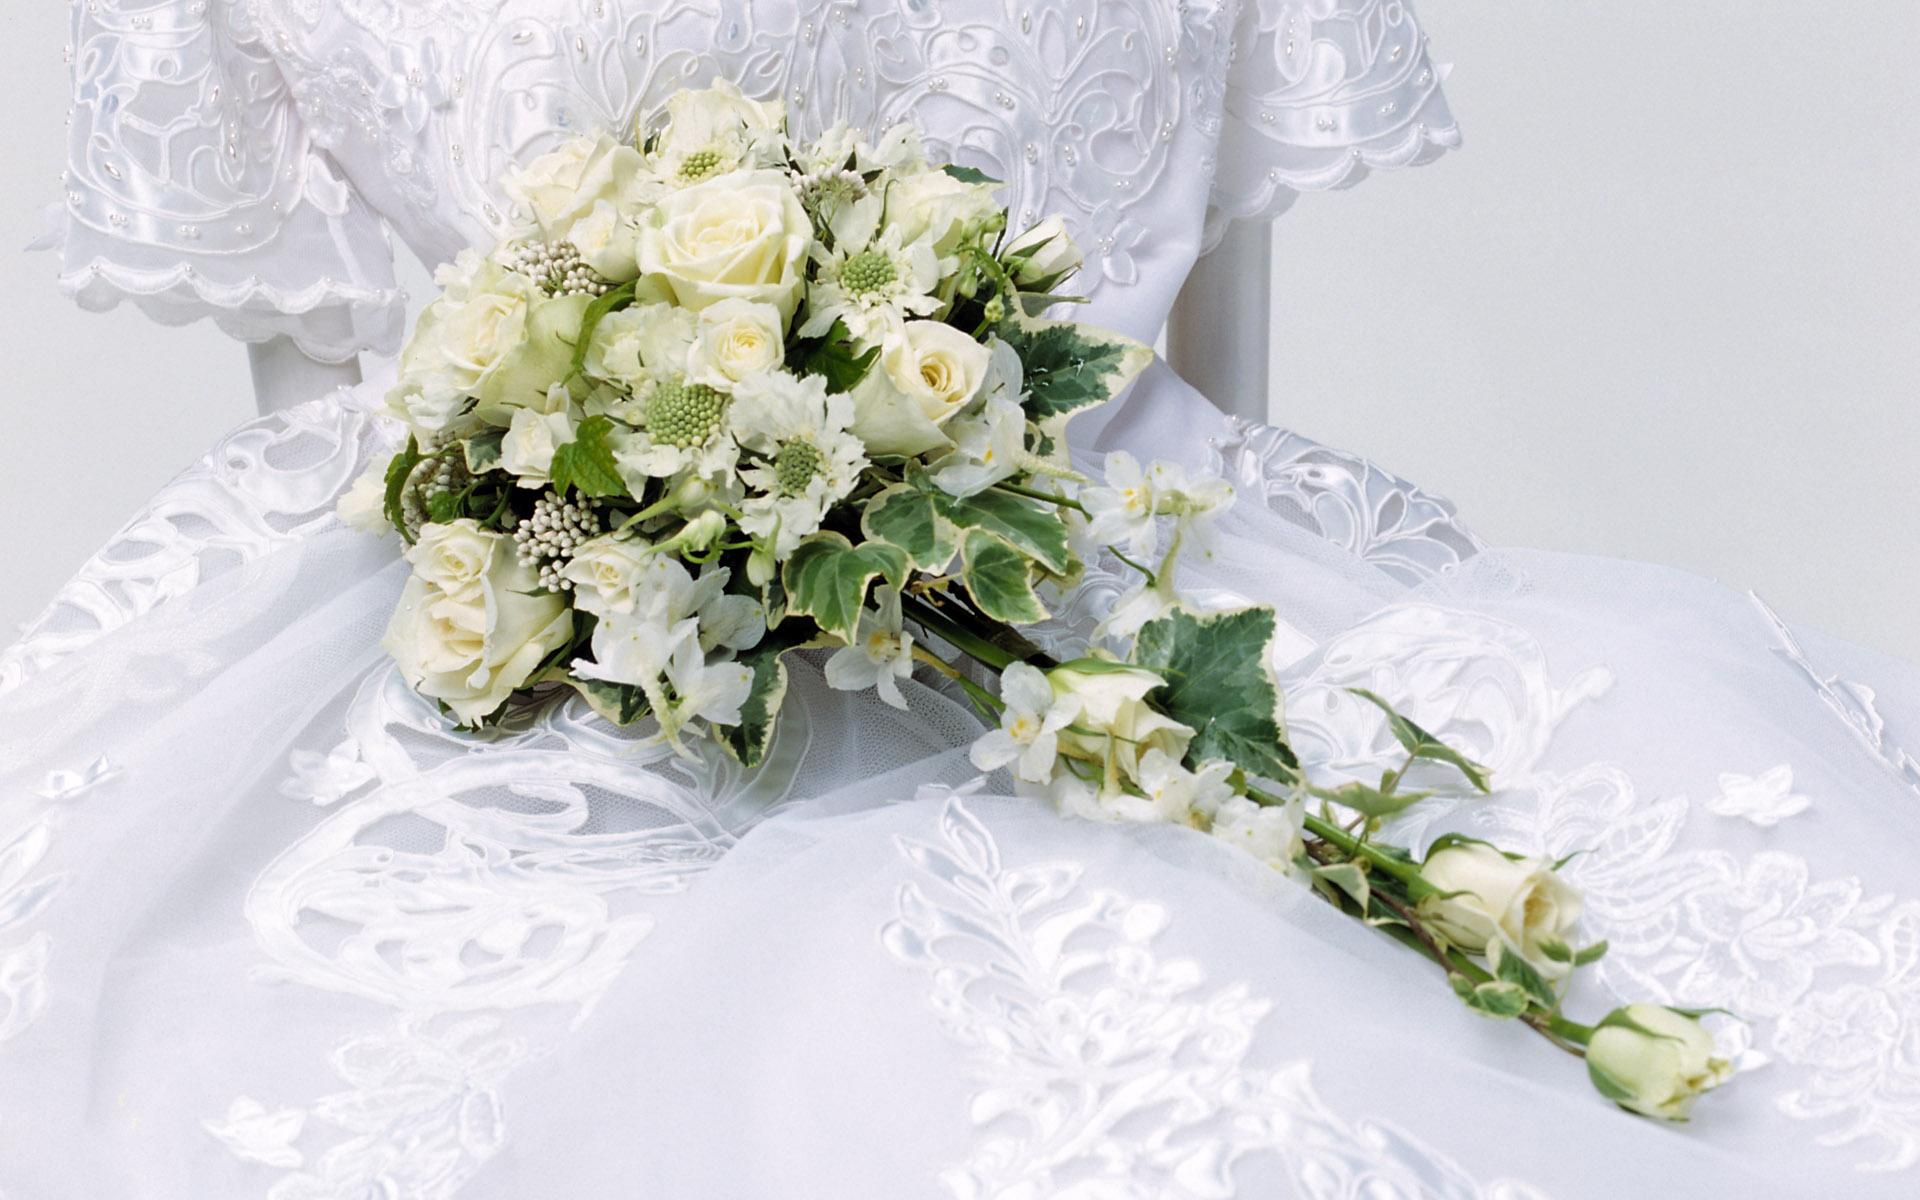 Basik ru обои на рабочий стол свадьба